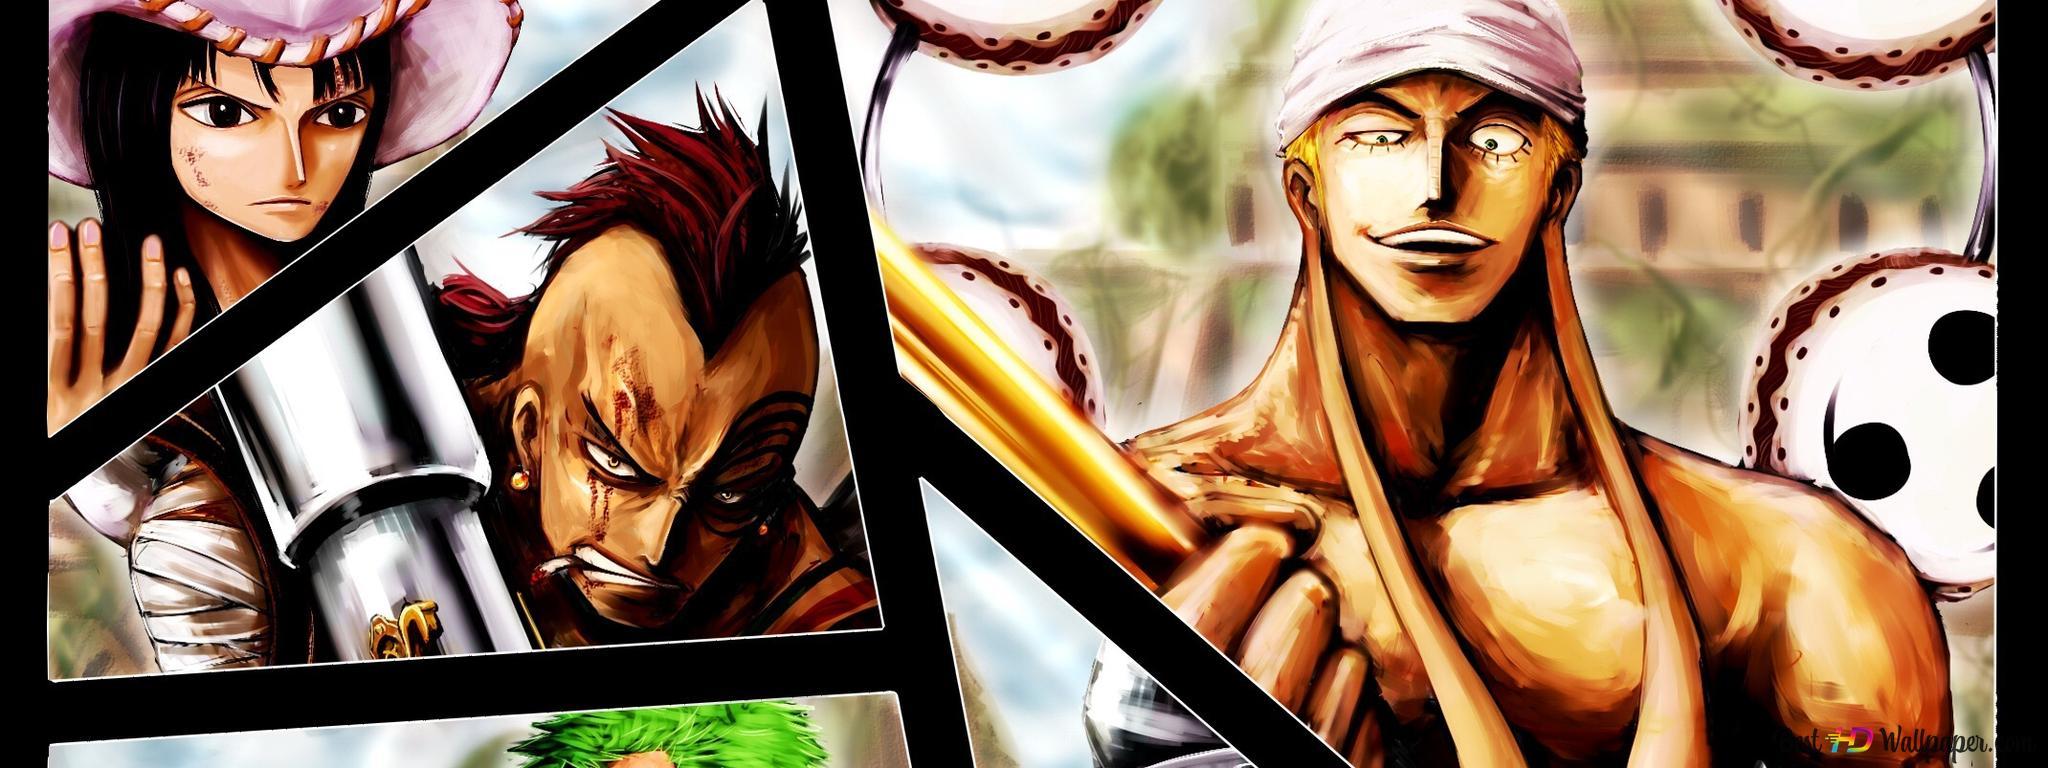 One Piece Skypiea Arc Hd Wallpaper Download